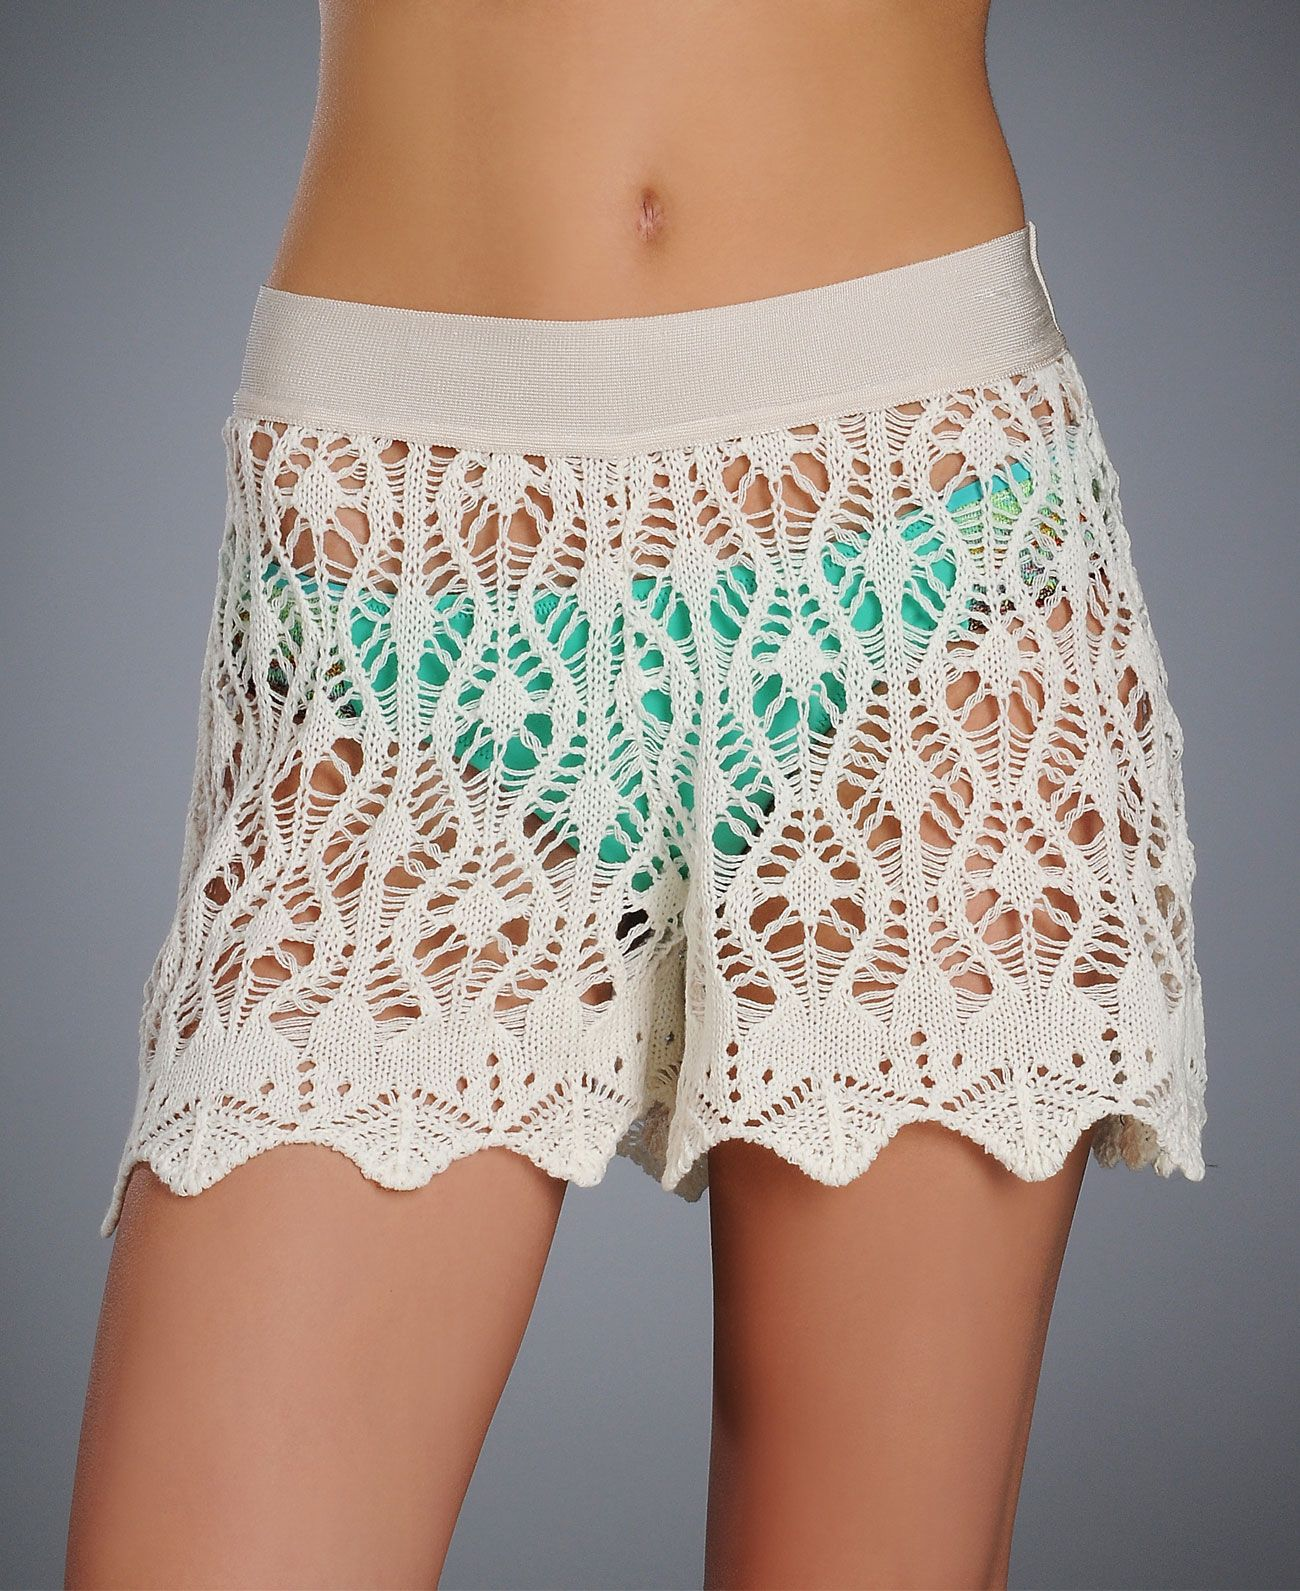 Crochet swim cover up shorts really beautiful inspiration but i cecilia prado mare maria crochet swim cover up shorts bankloansurffo Images